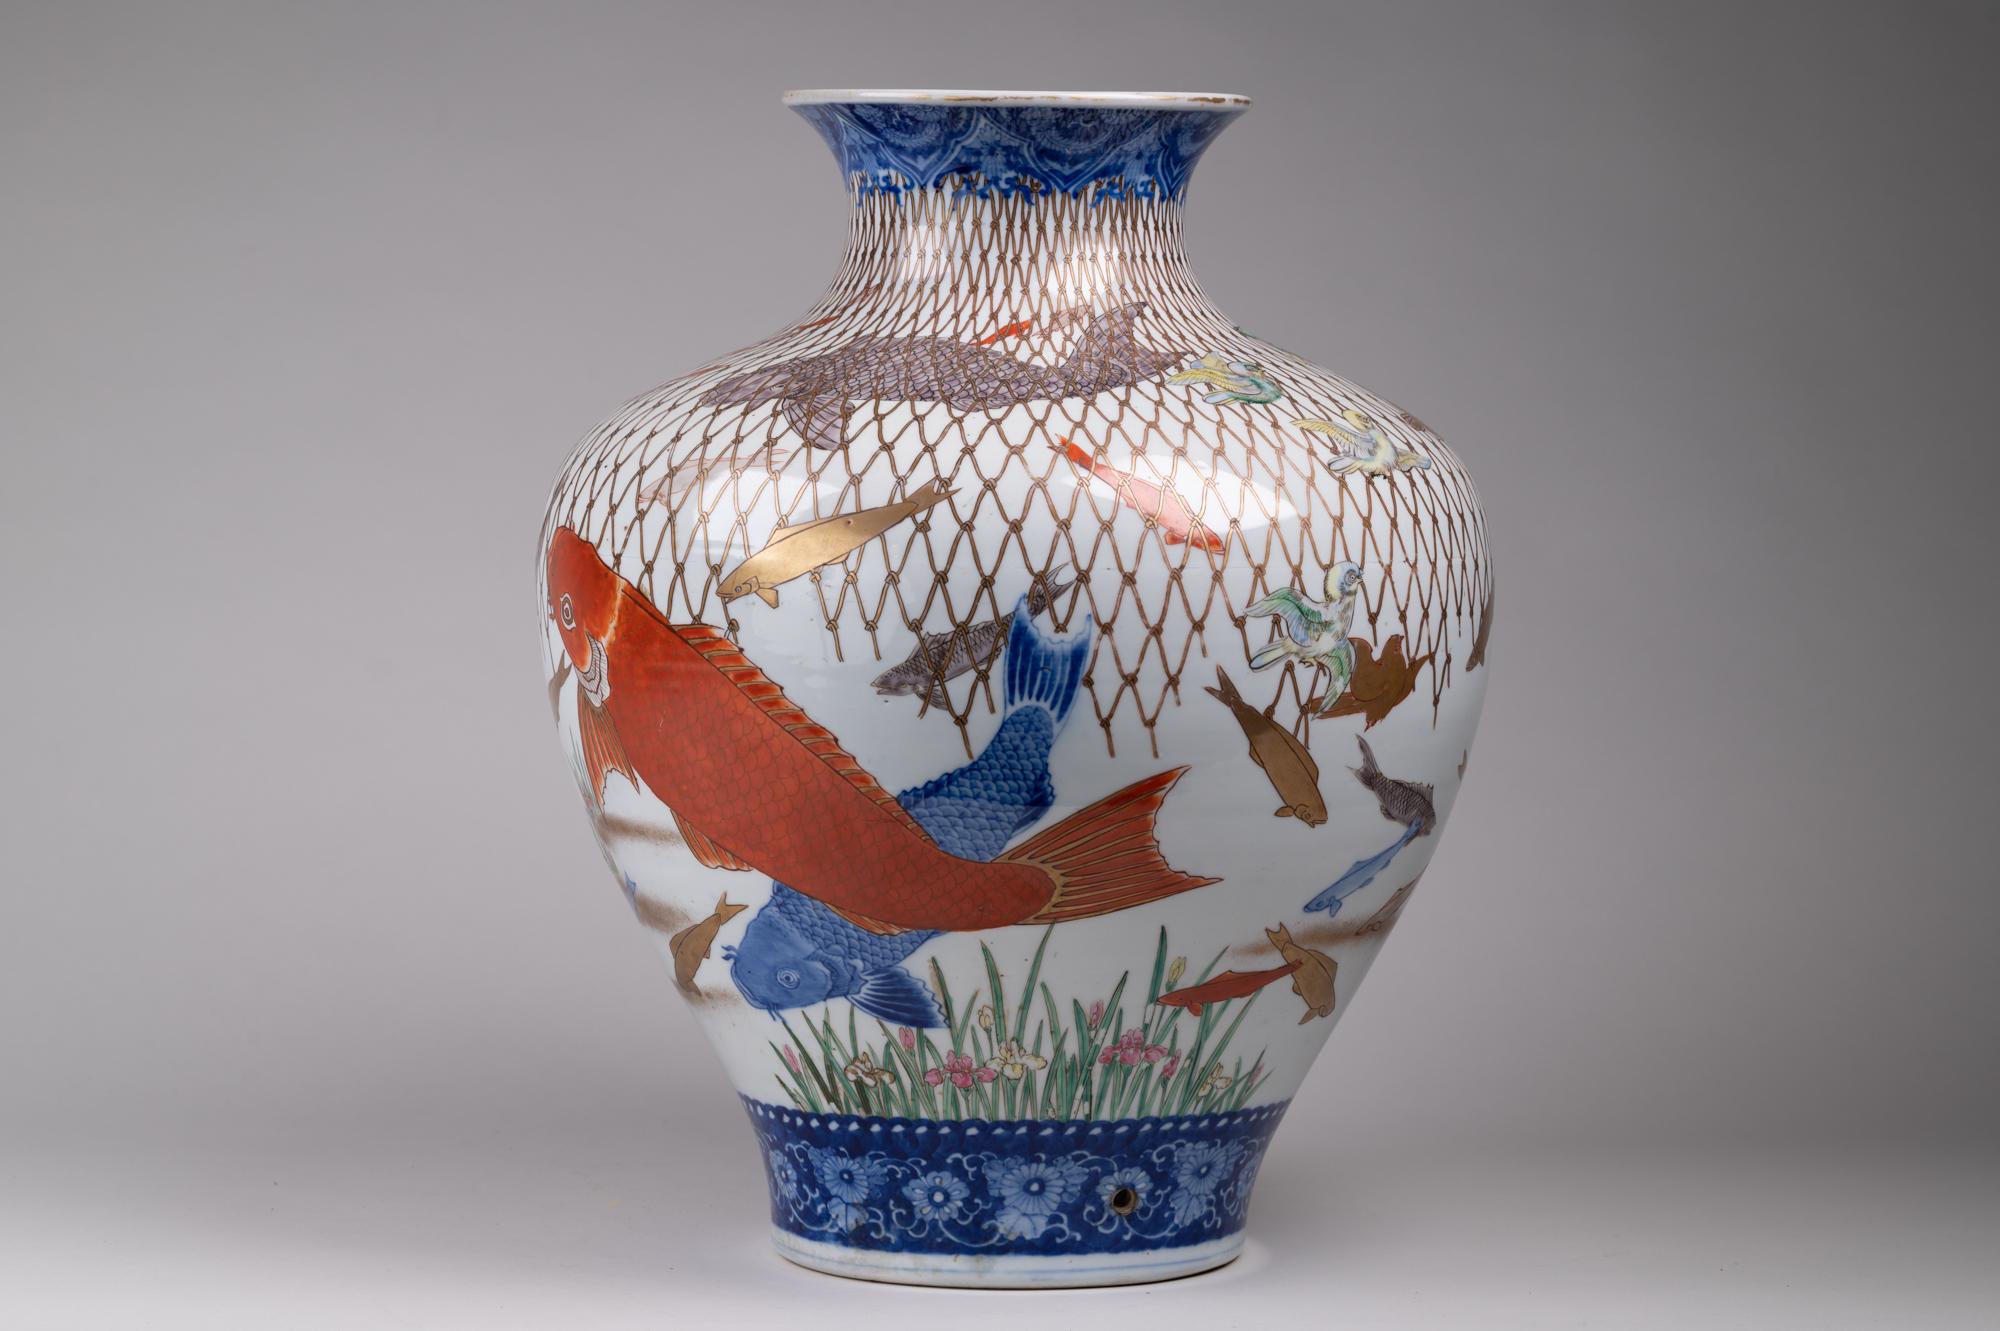 Japanese Vase, Japanese Antique, Imari, Imari Vase